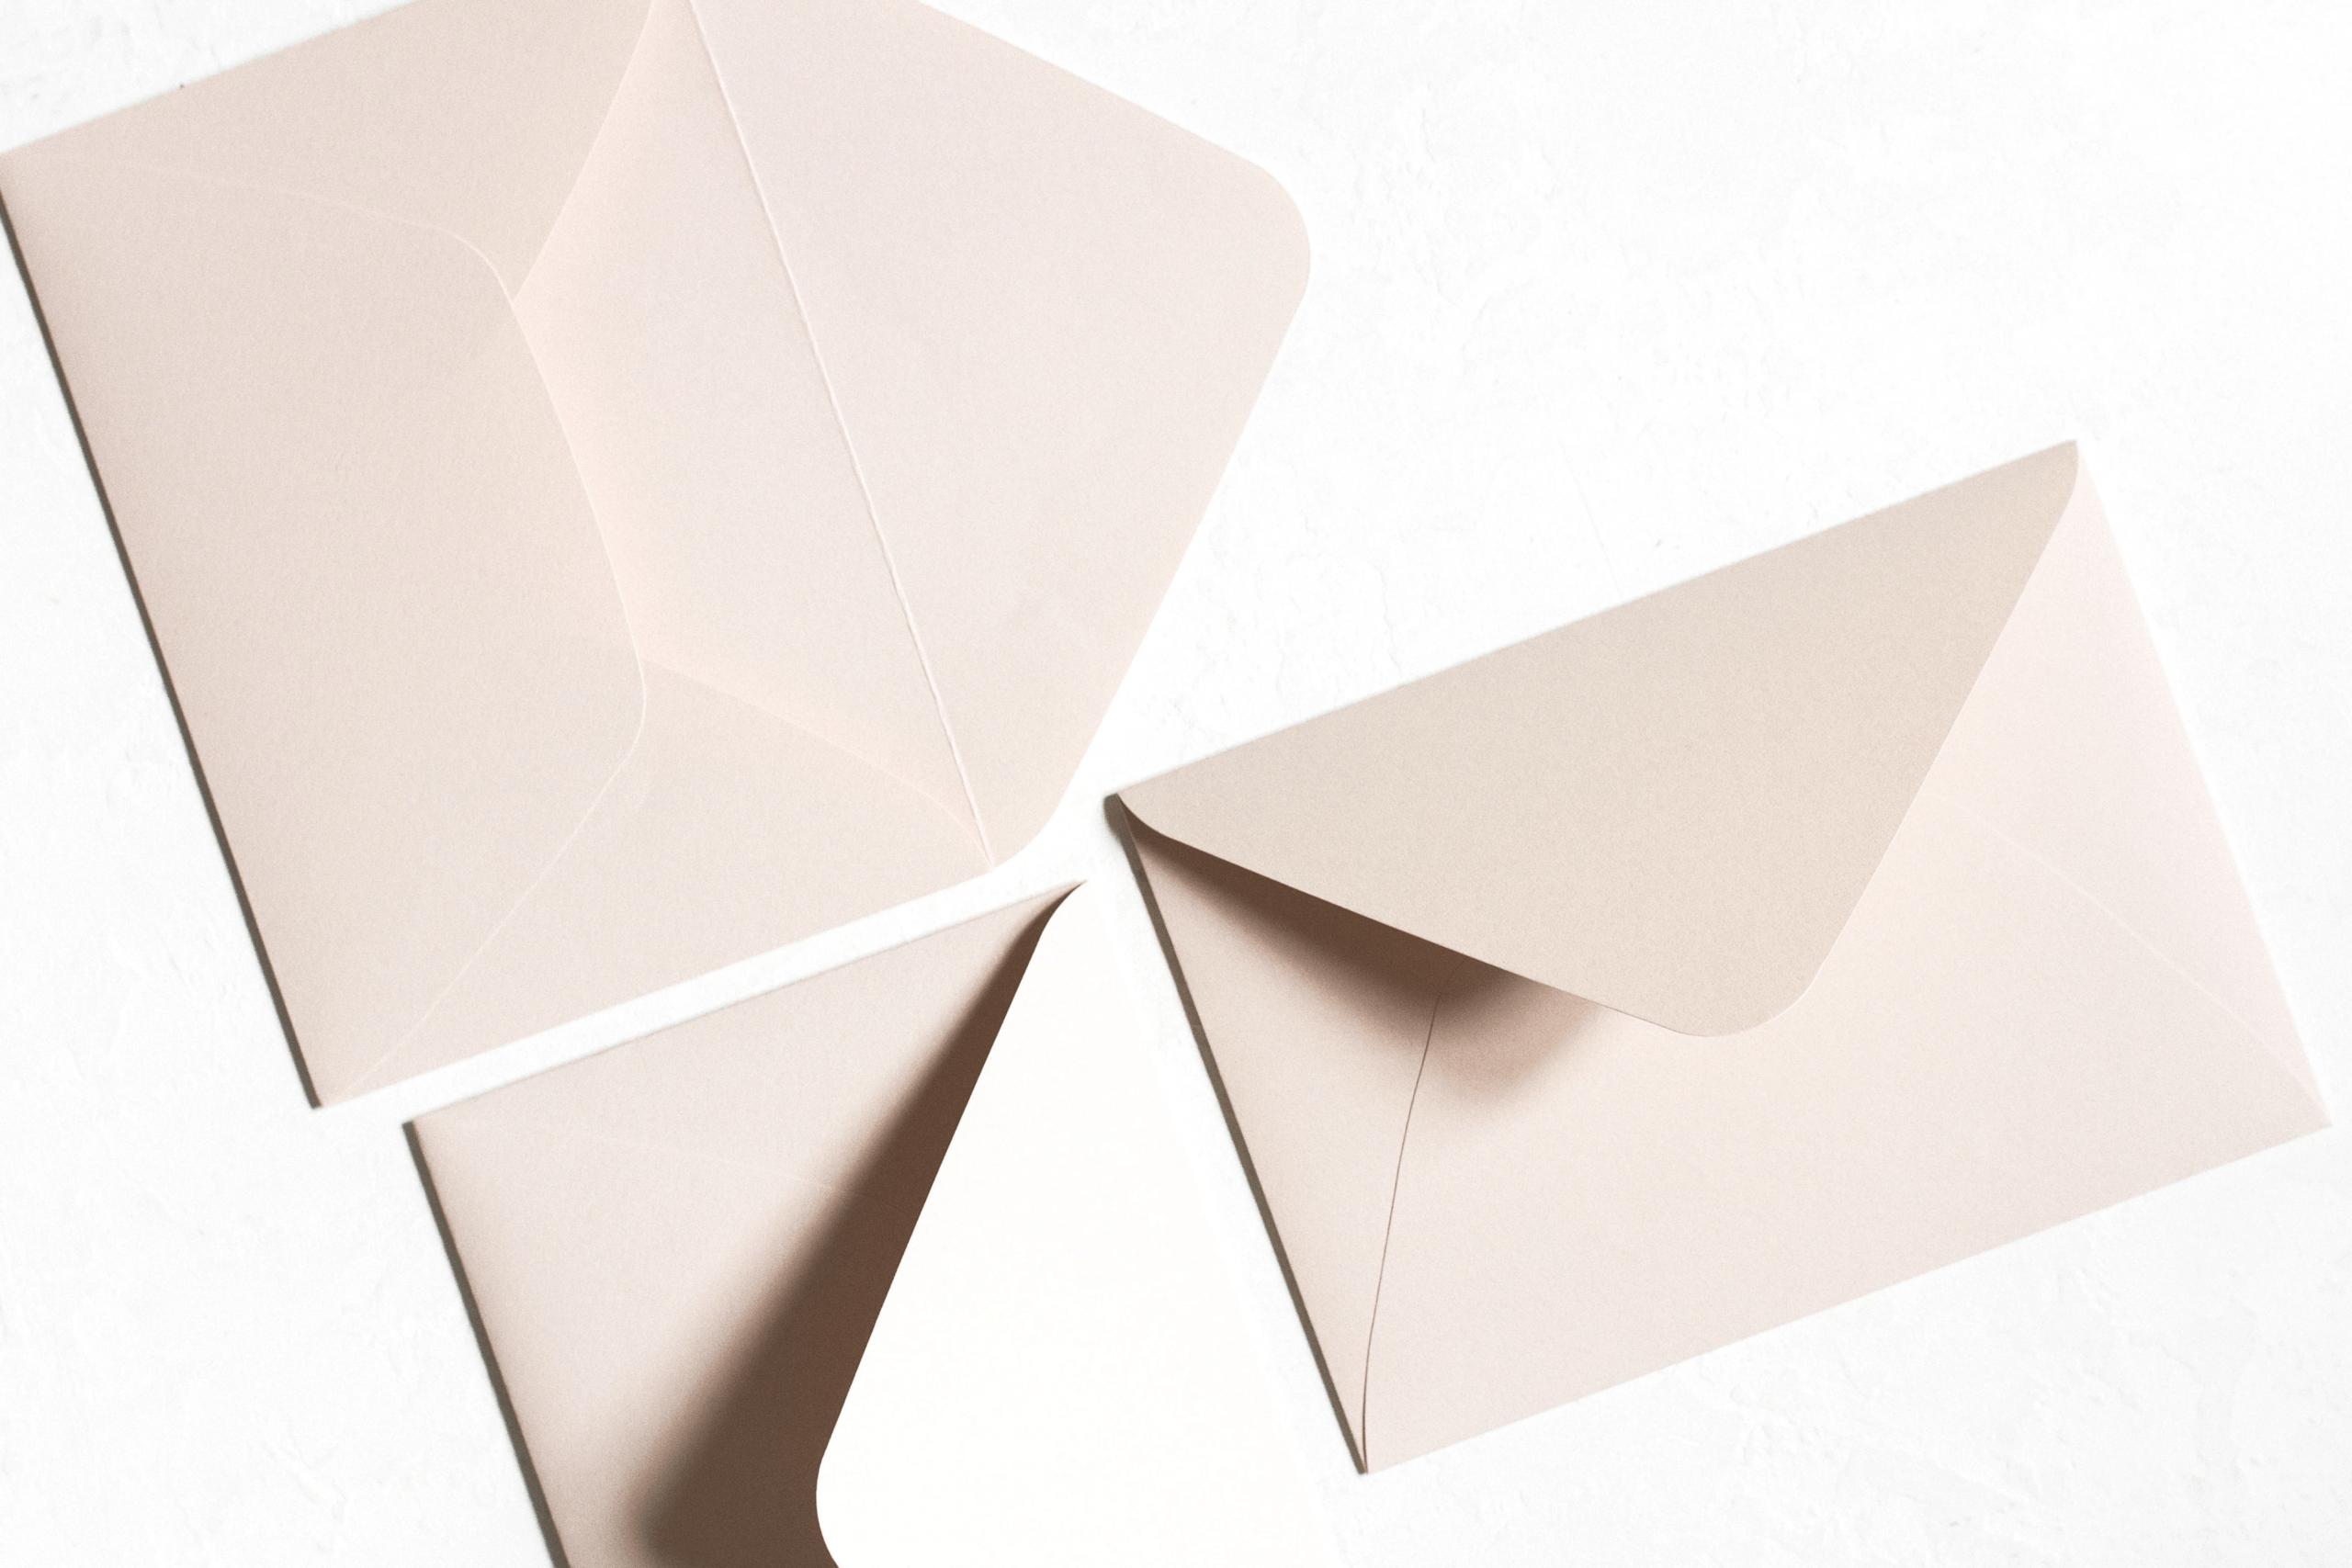 norm envelope